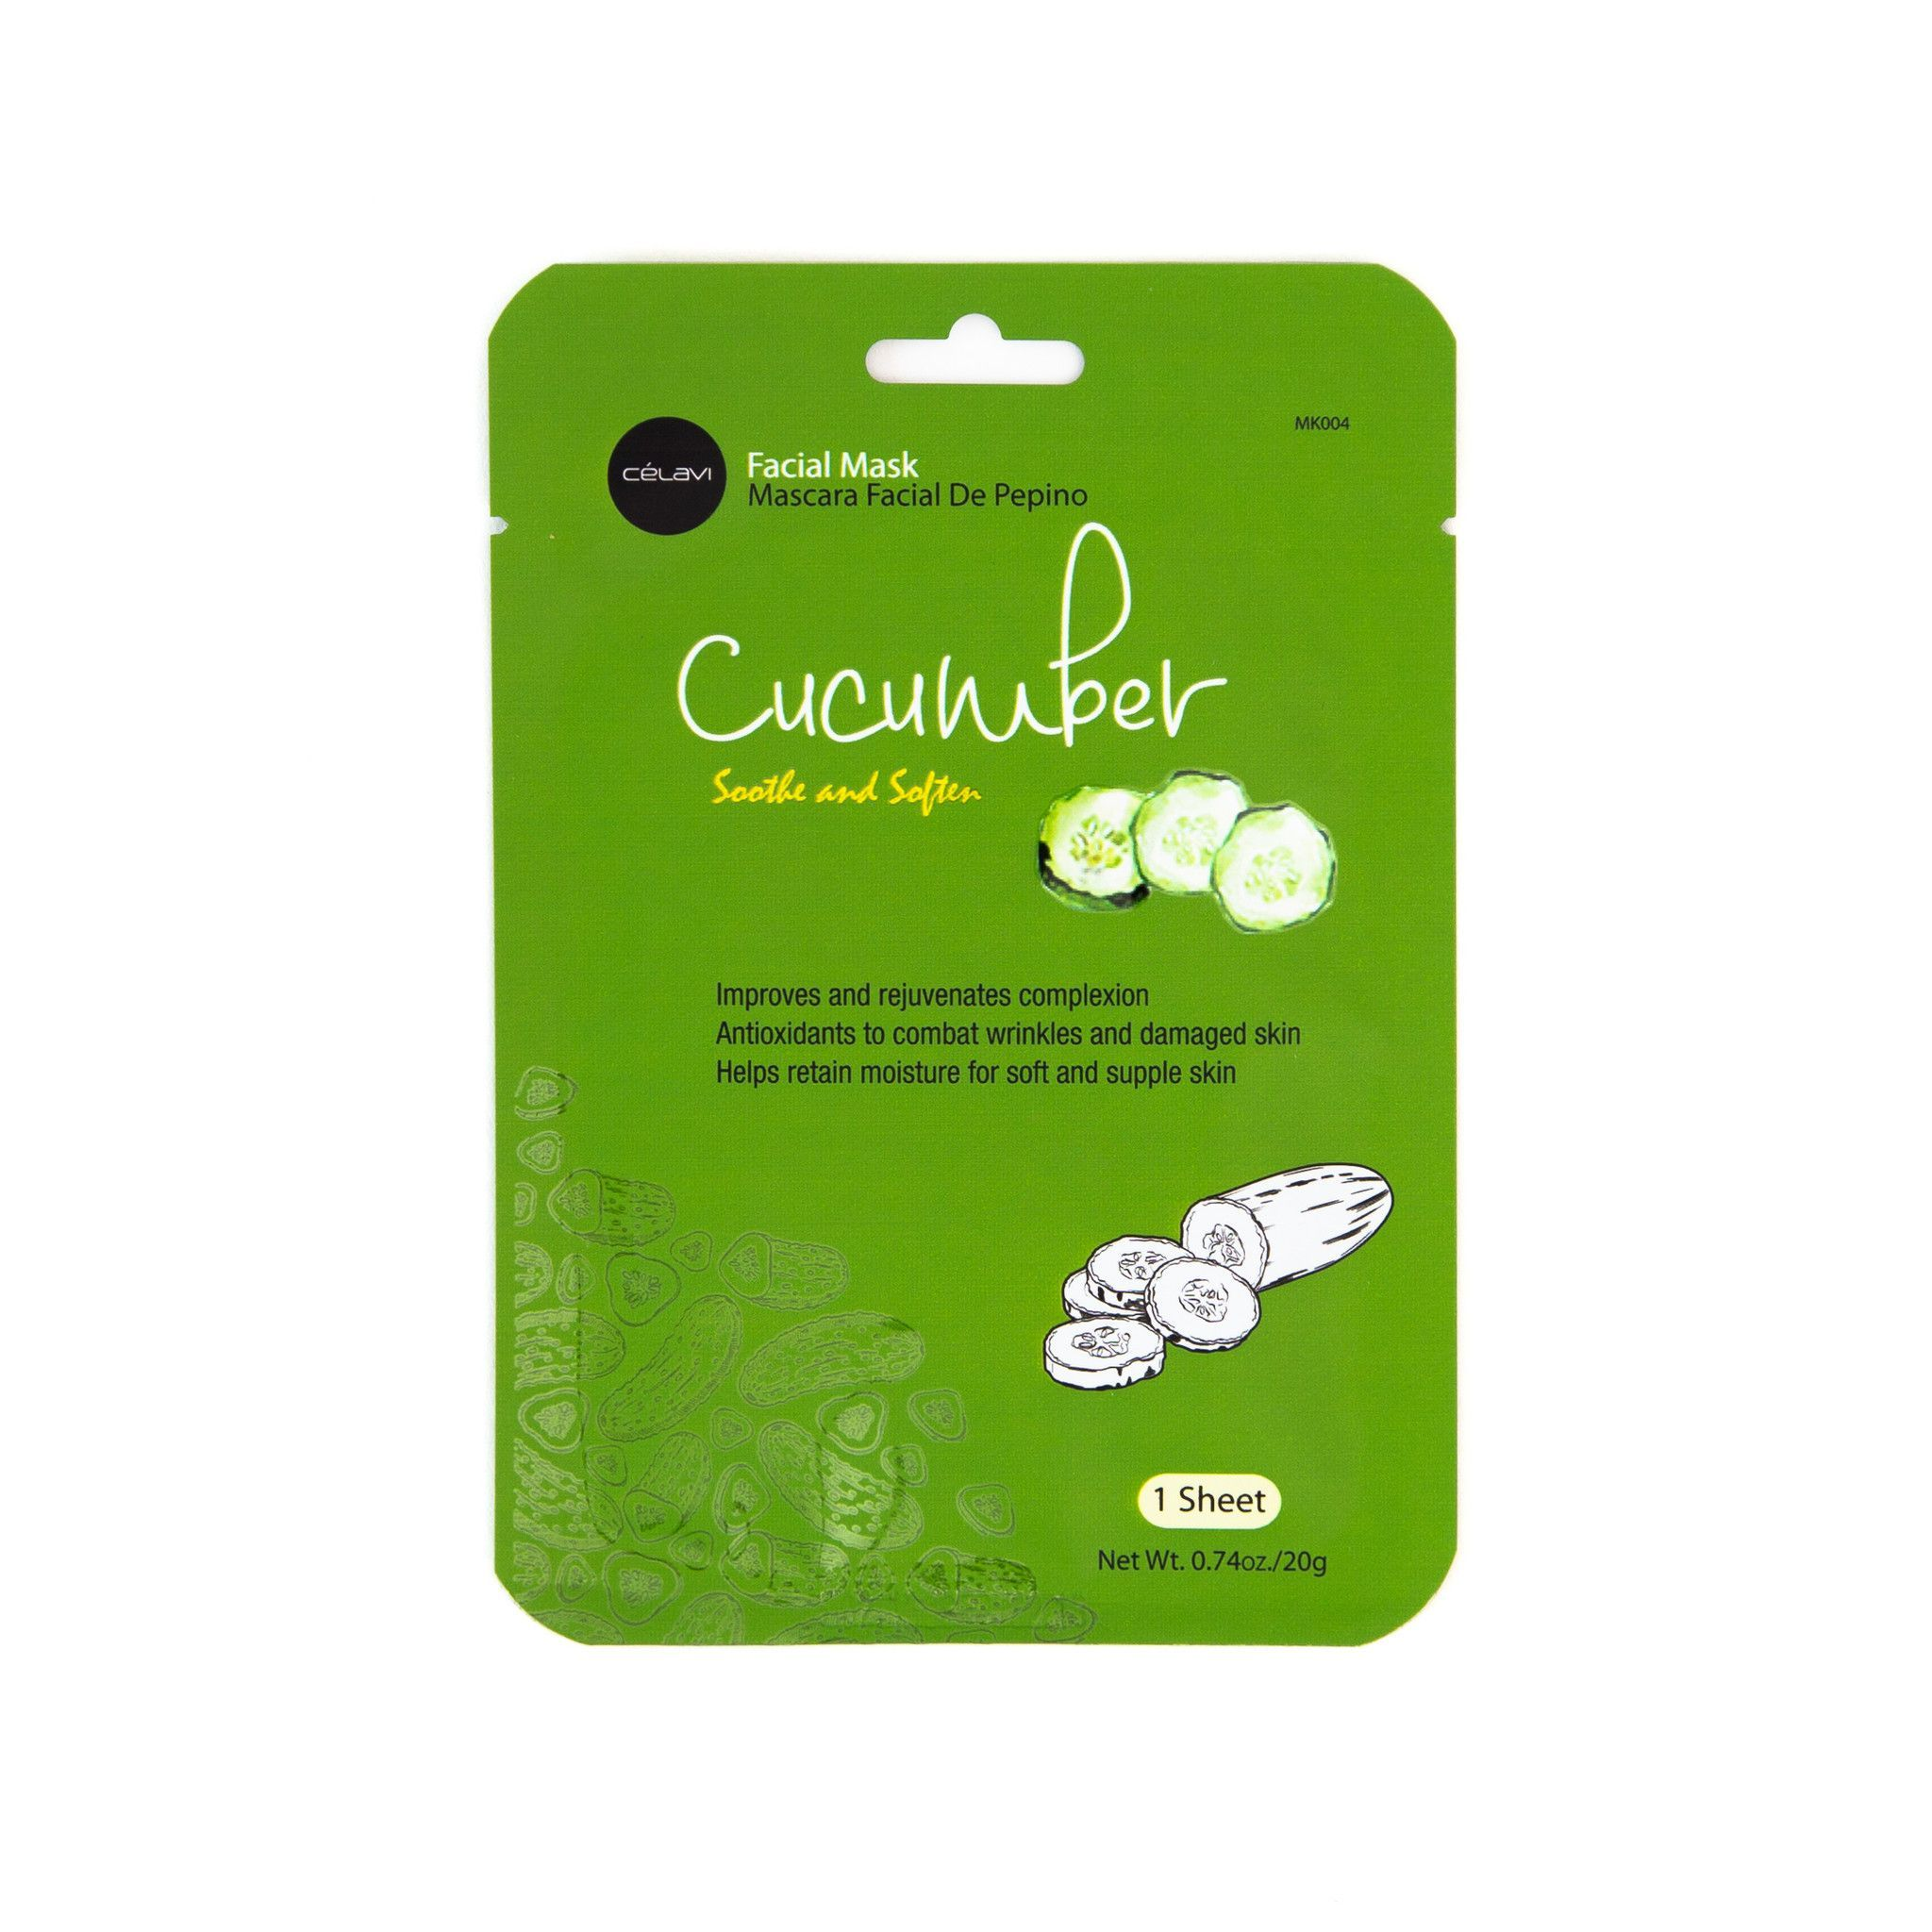 Facial Mask - Cucumber   Skin care   Pinterest